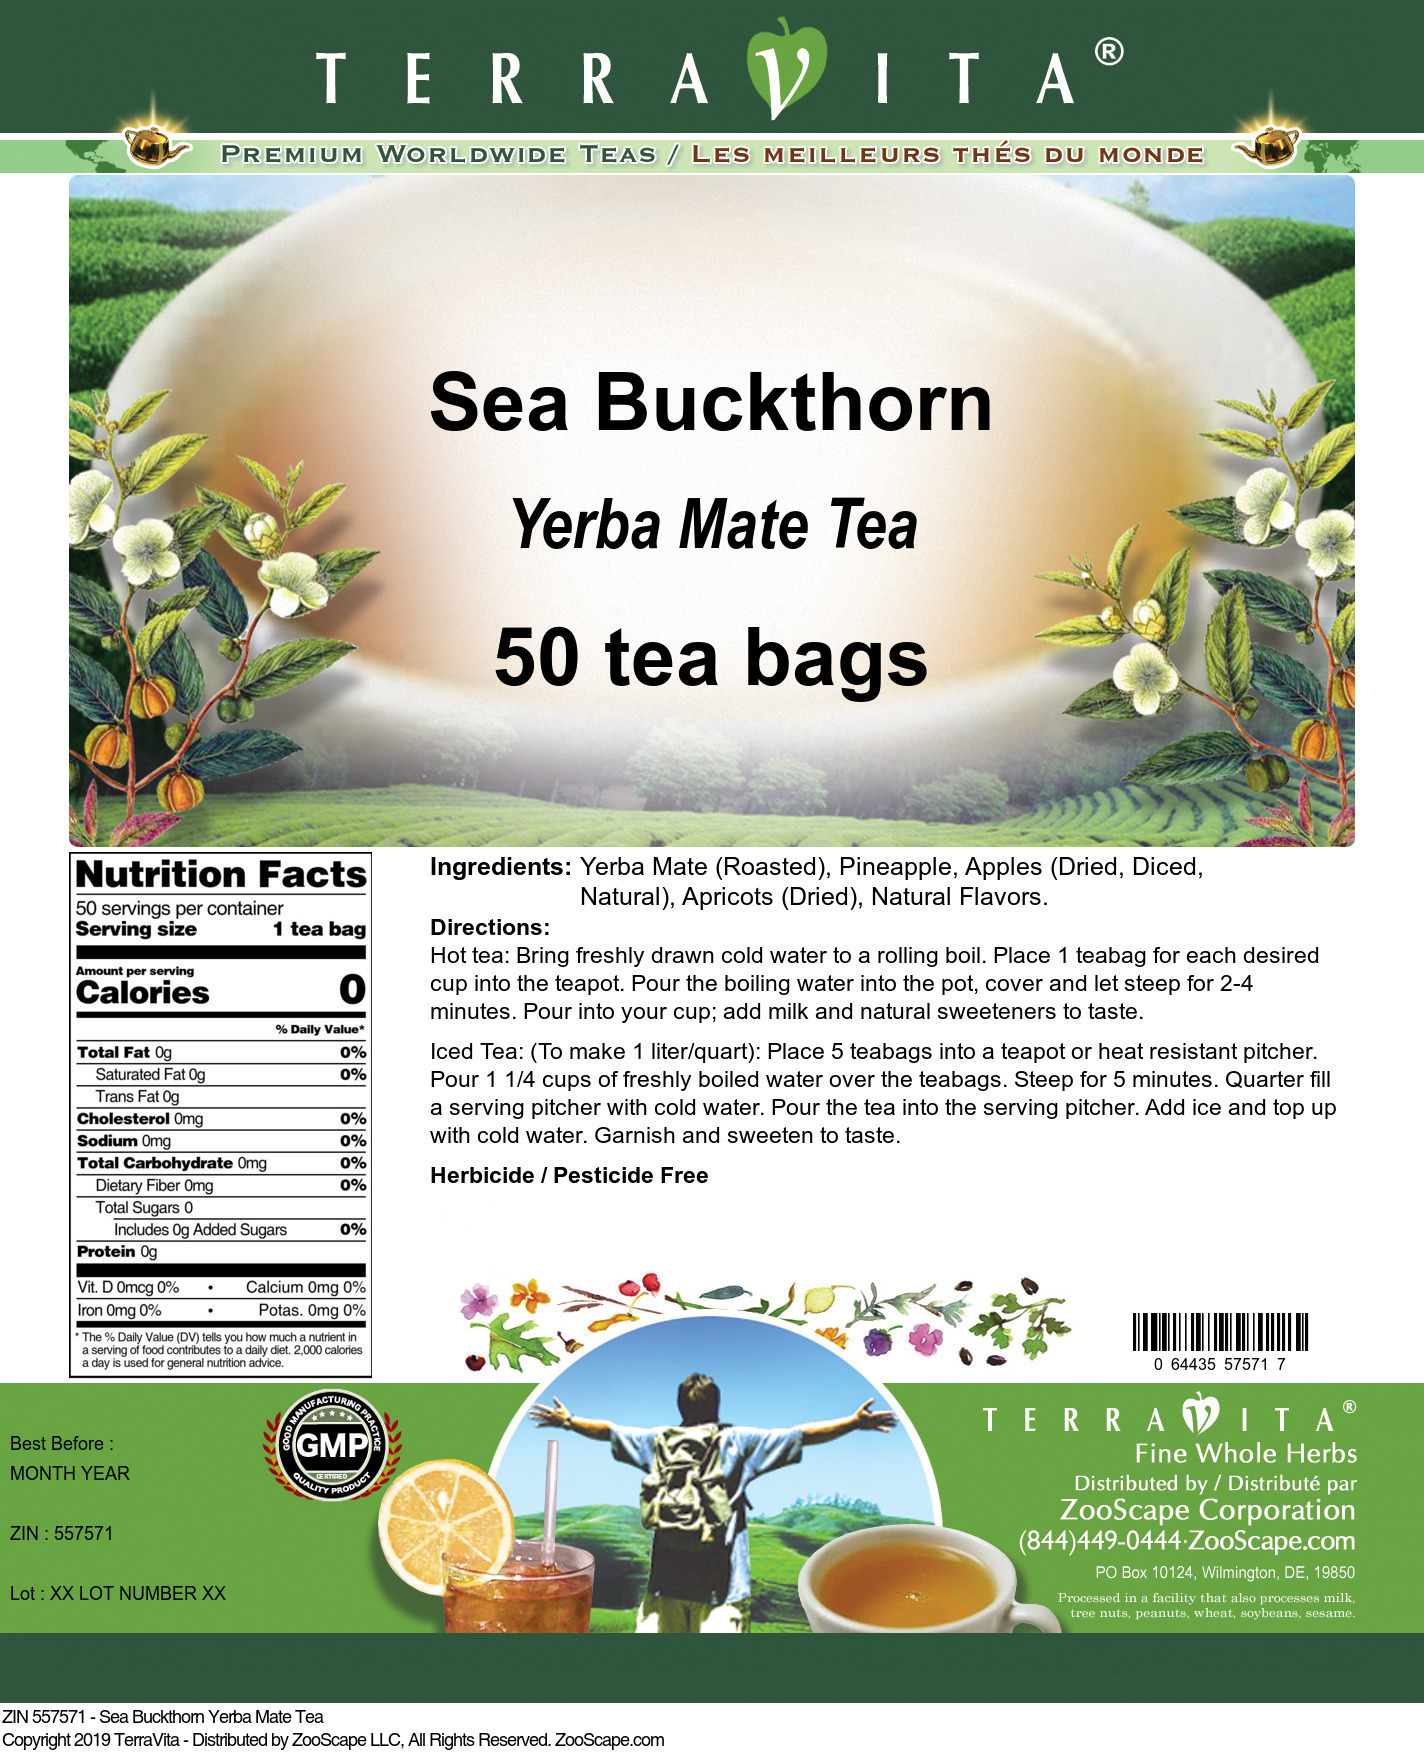 Sea Buckthorn Yerba Mate Tea